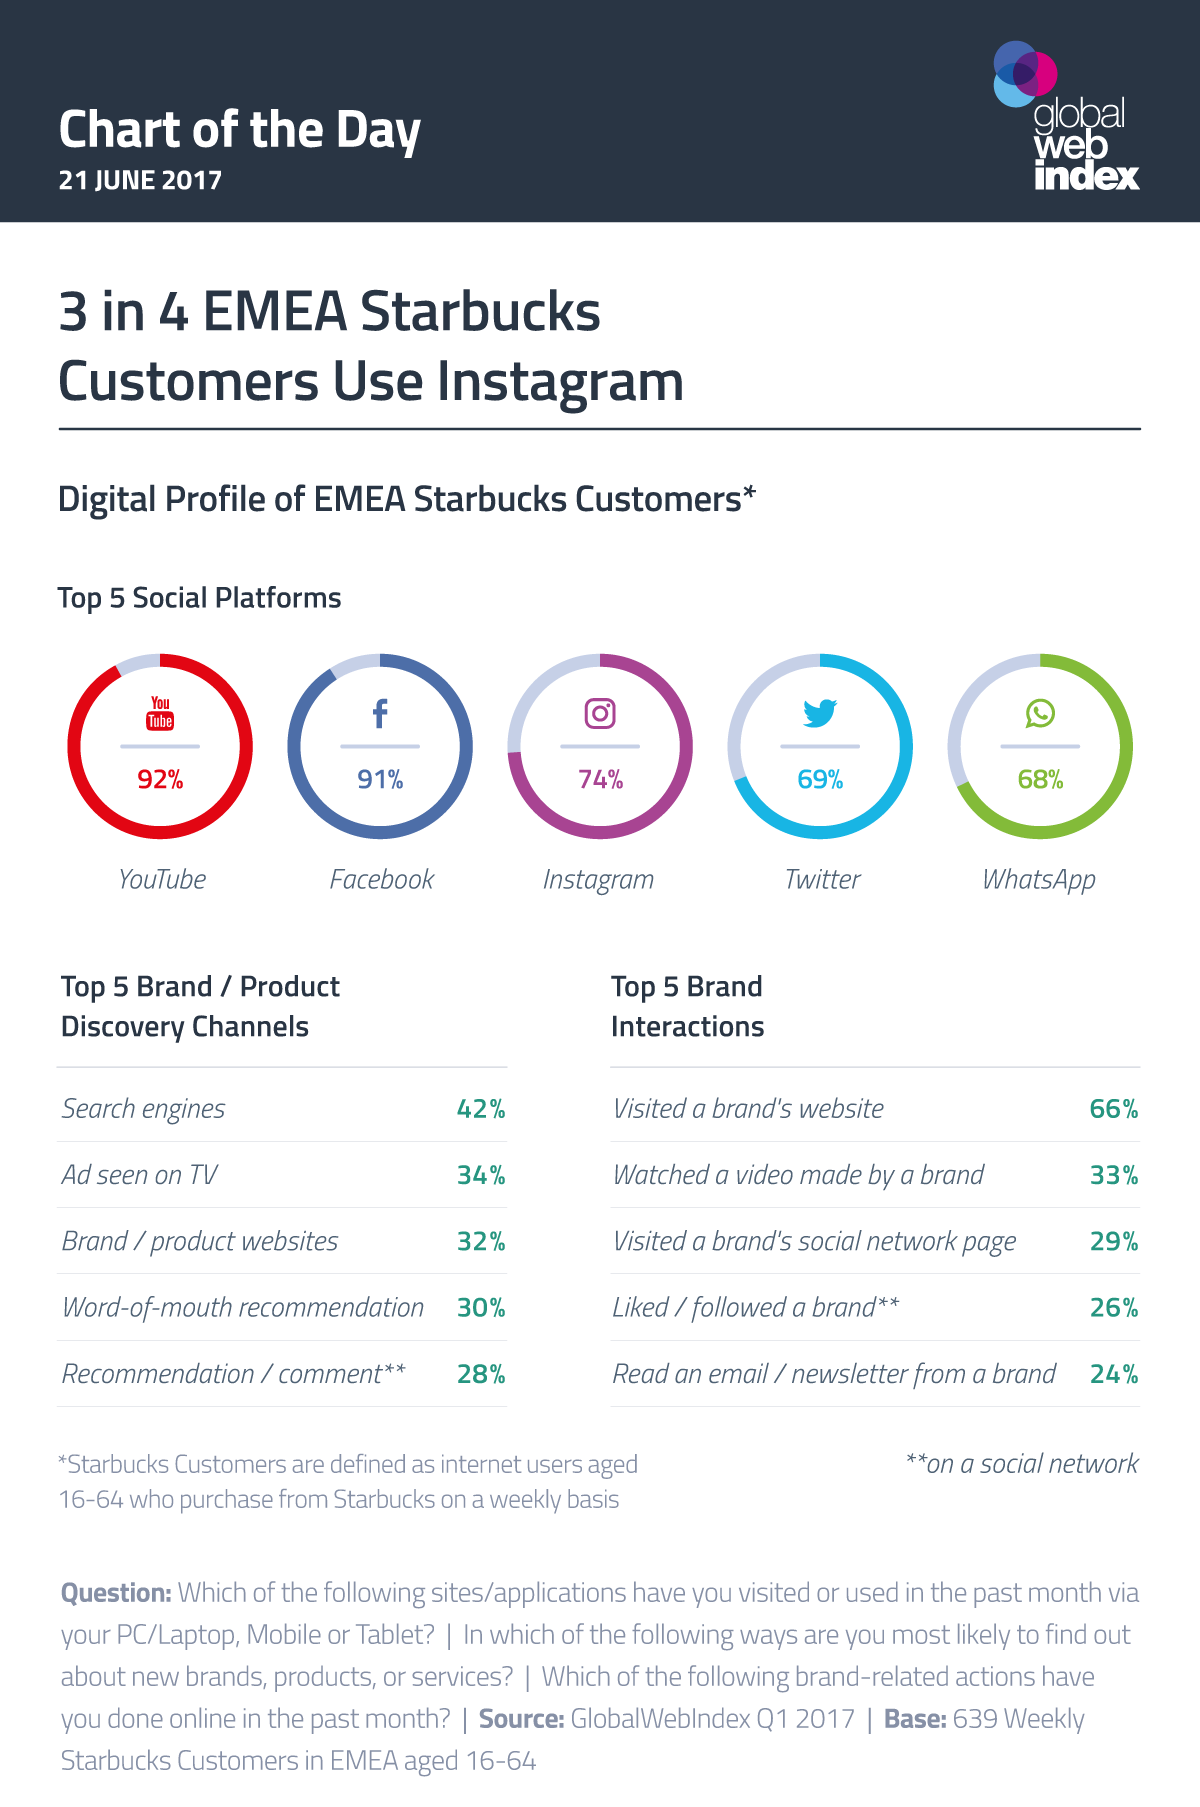 3 in 4 EMEA Starbucks Customers Use Instagram